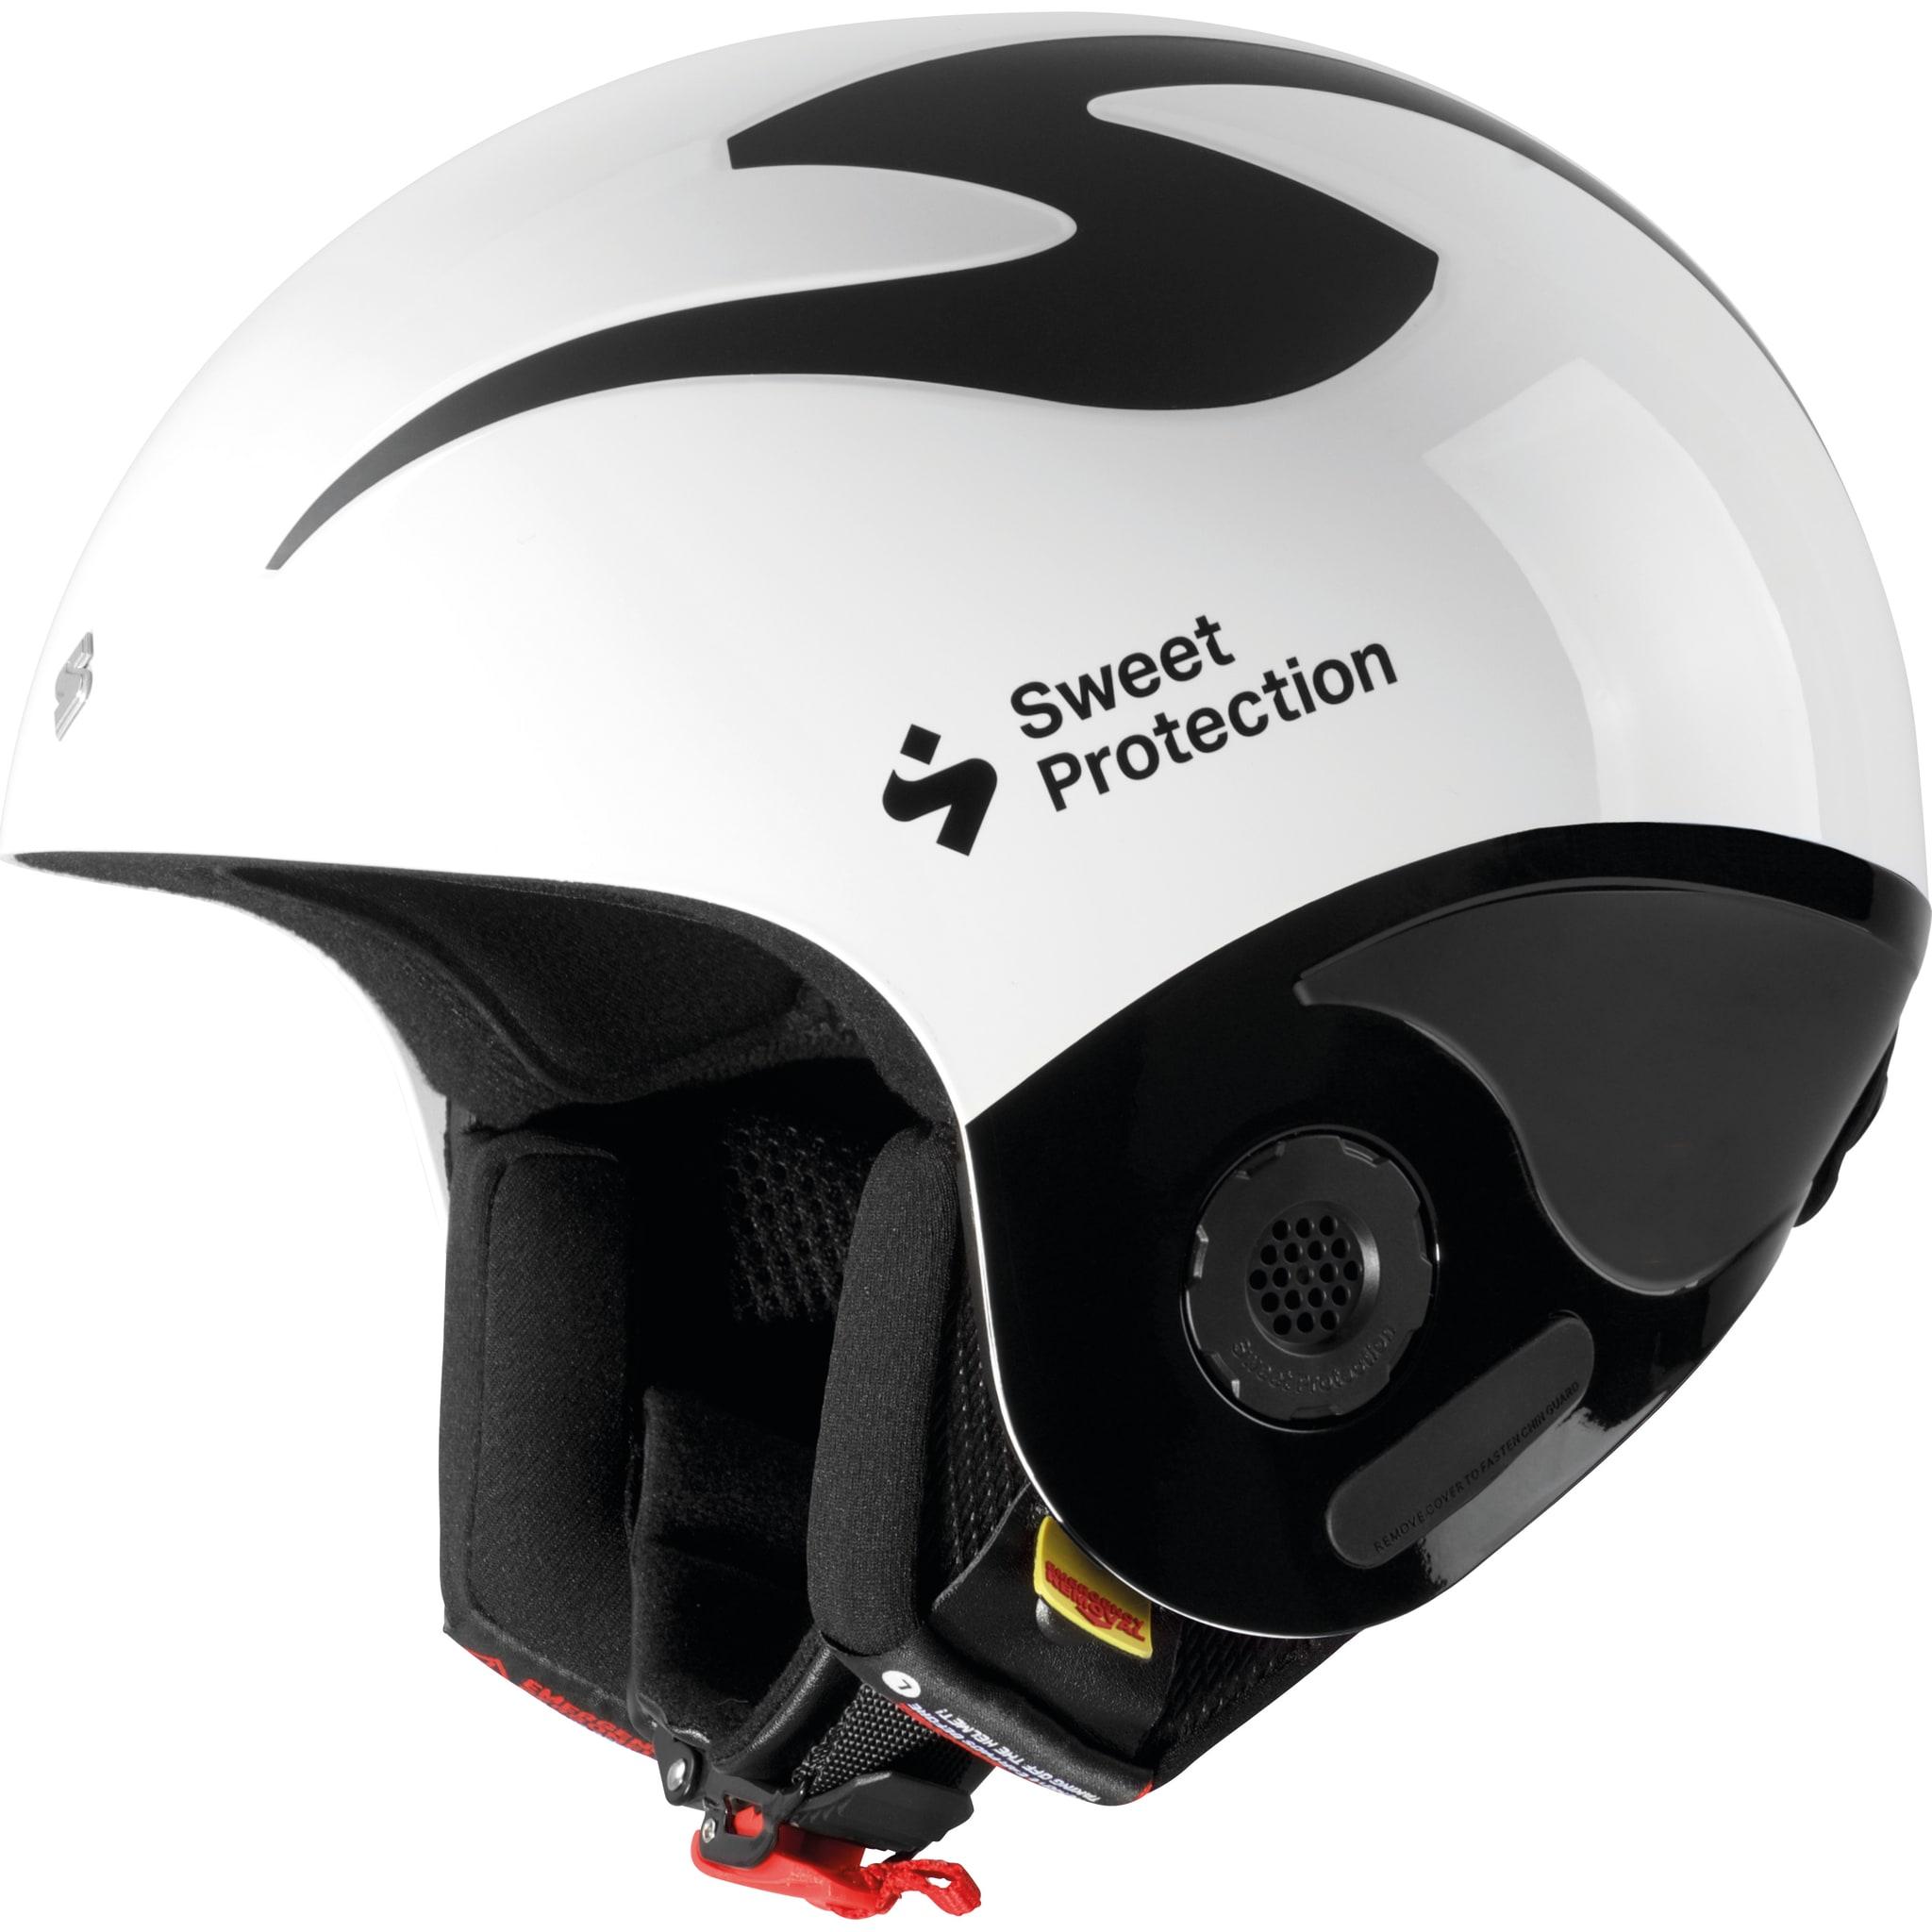 Racing-hjelm tilpasset samtlige disipliner